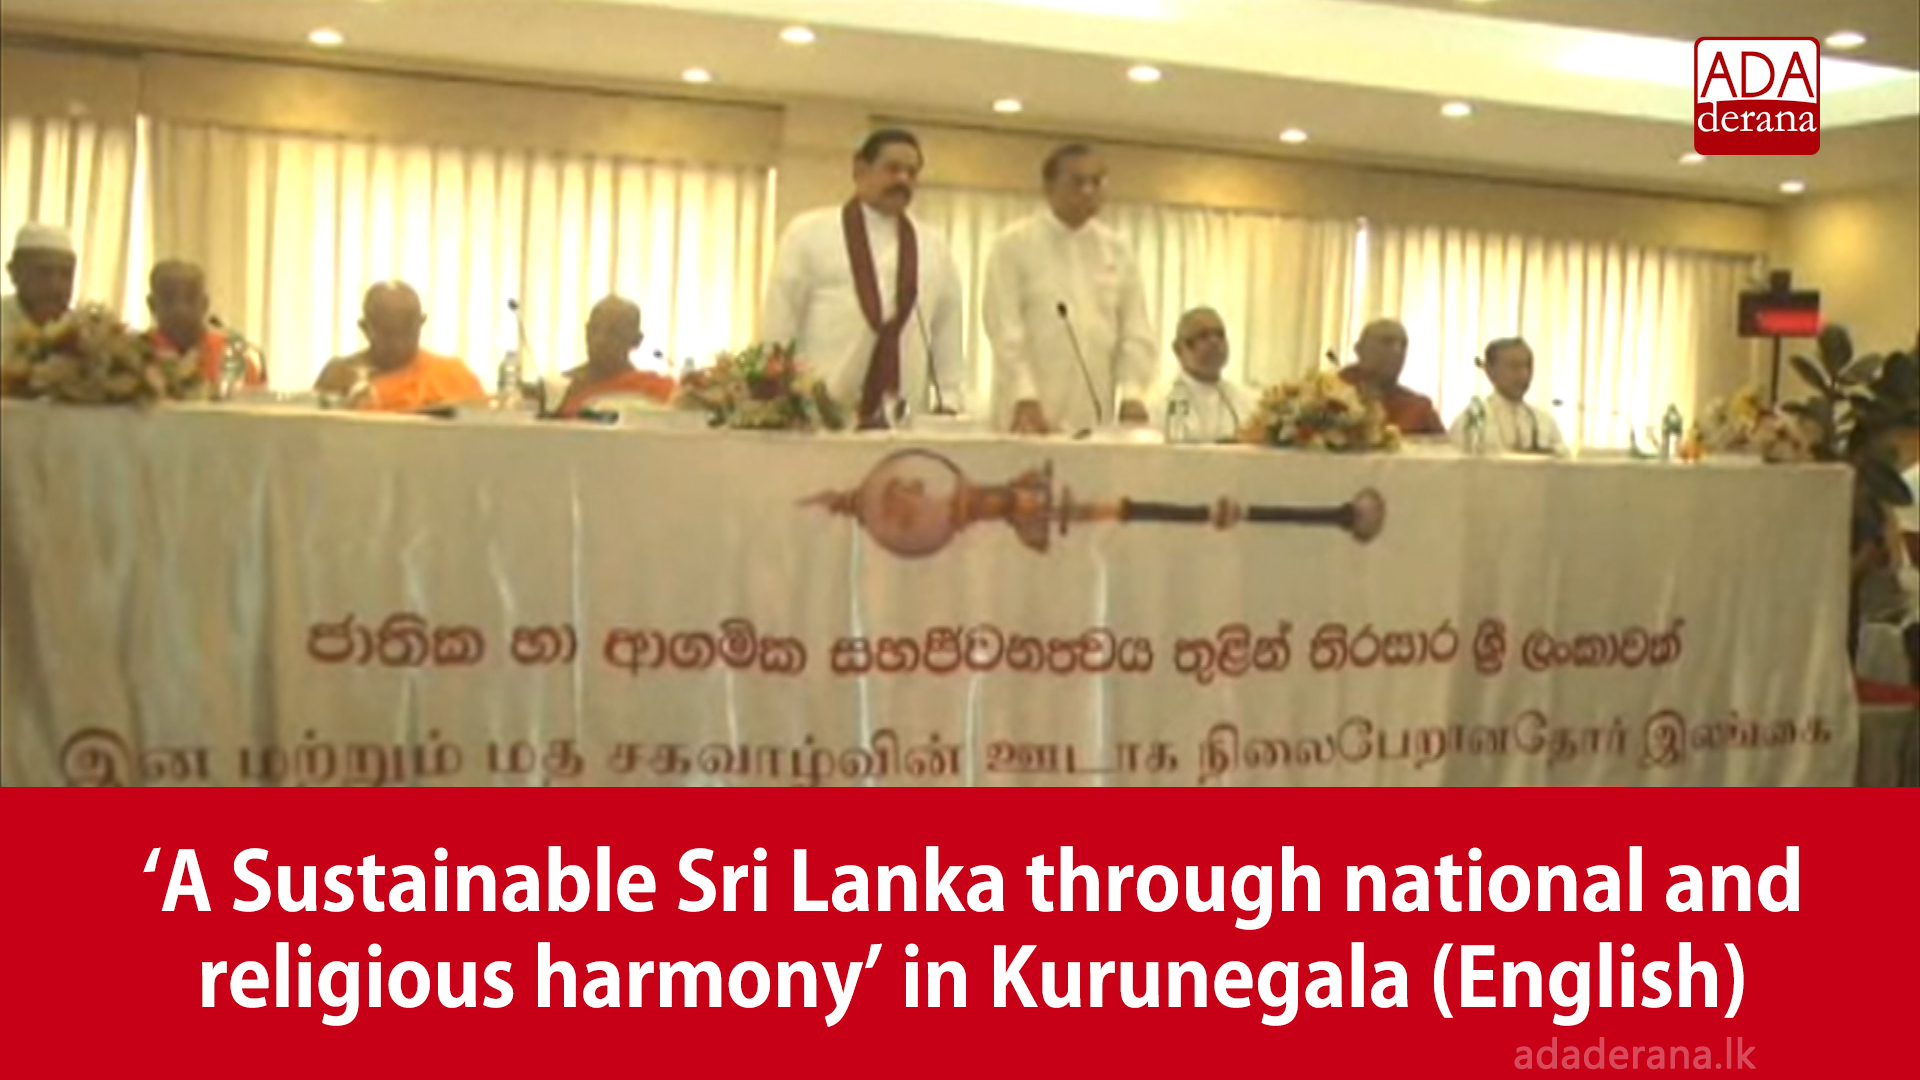 'A Sustainable Sri Lanka through national and religious harmony' in Kurunegala (English)